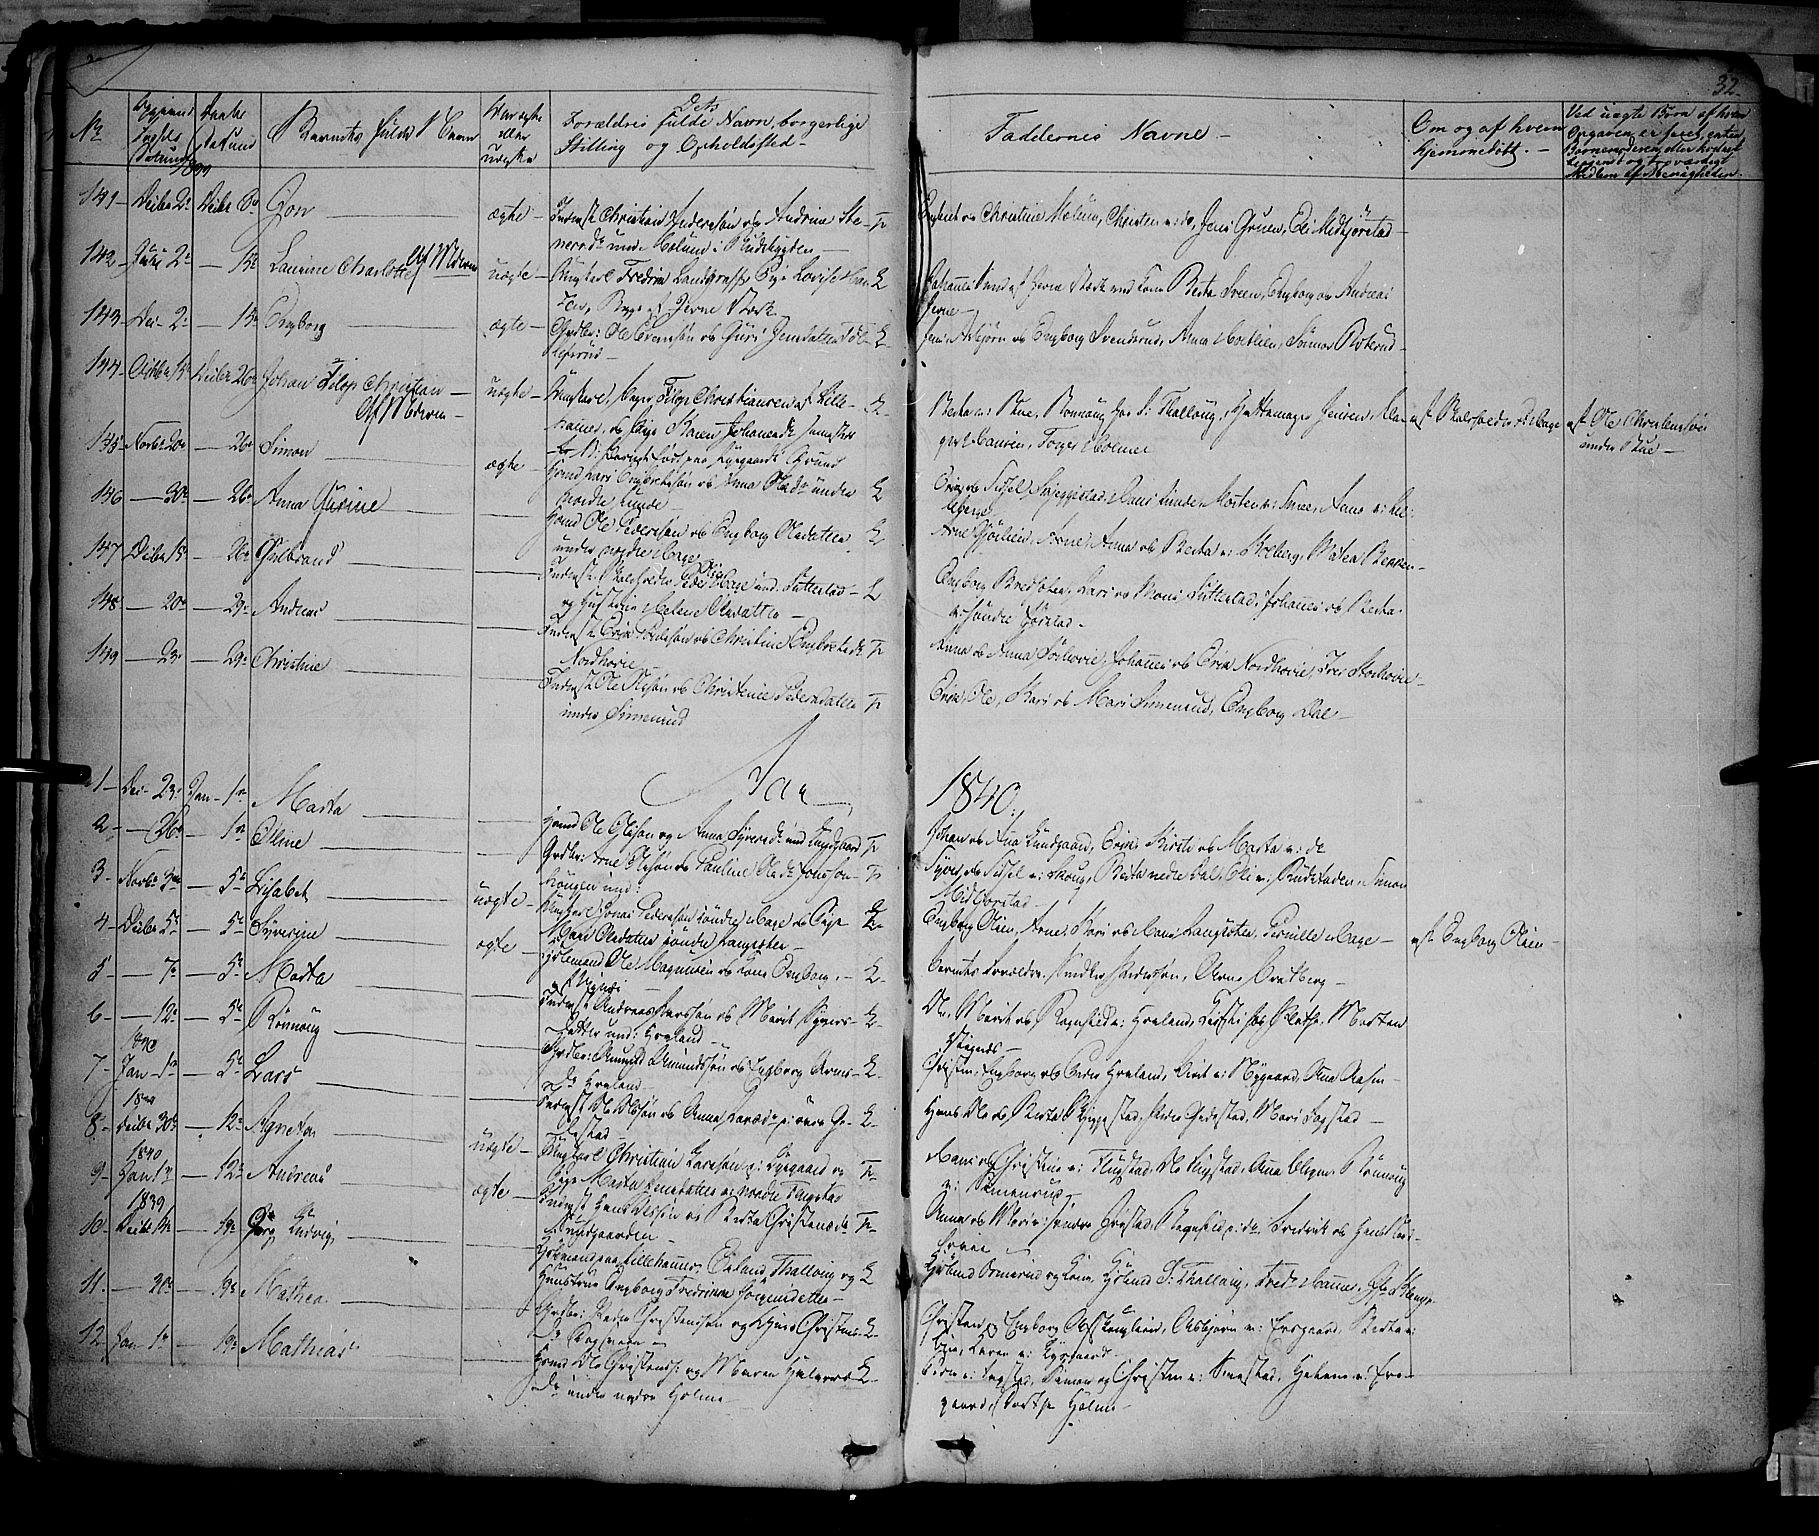 SAH, Fåberg prestekontor, Ministerialbok nr. 5, 1836-1854, s. 31-32